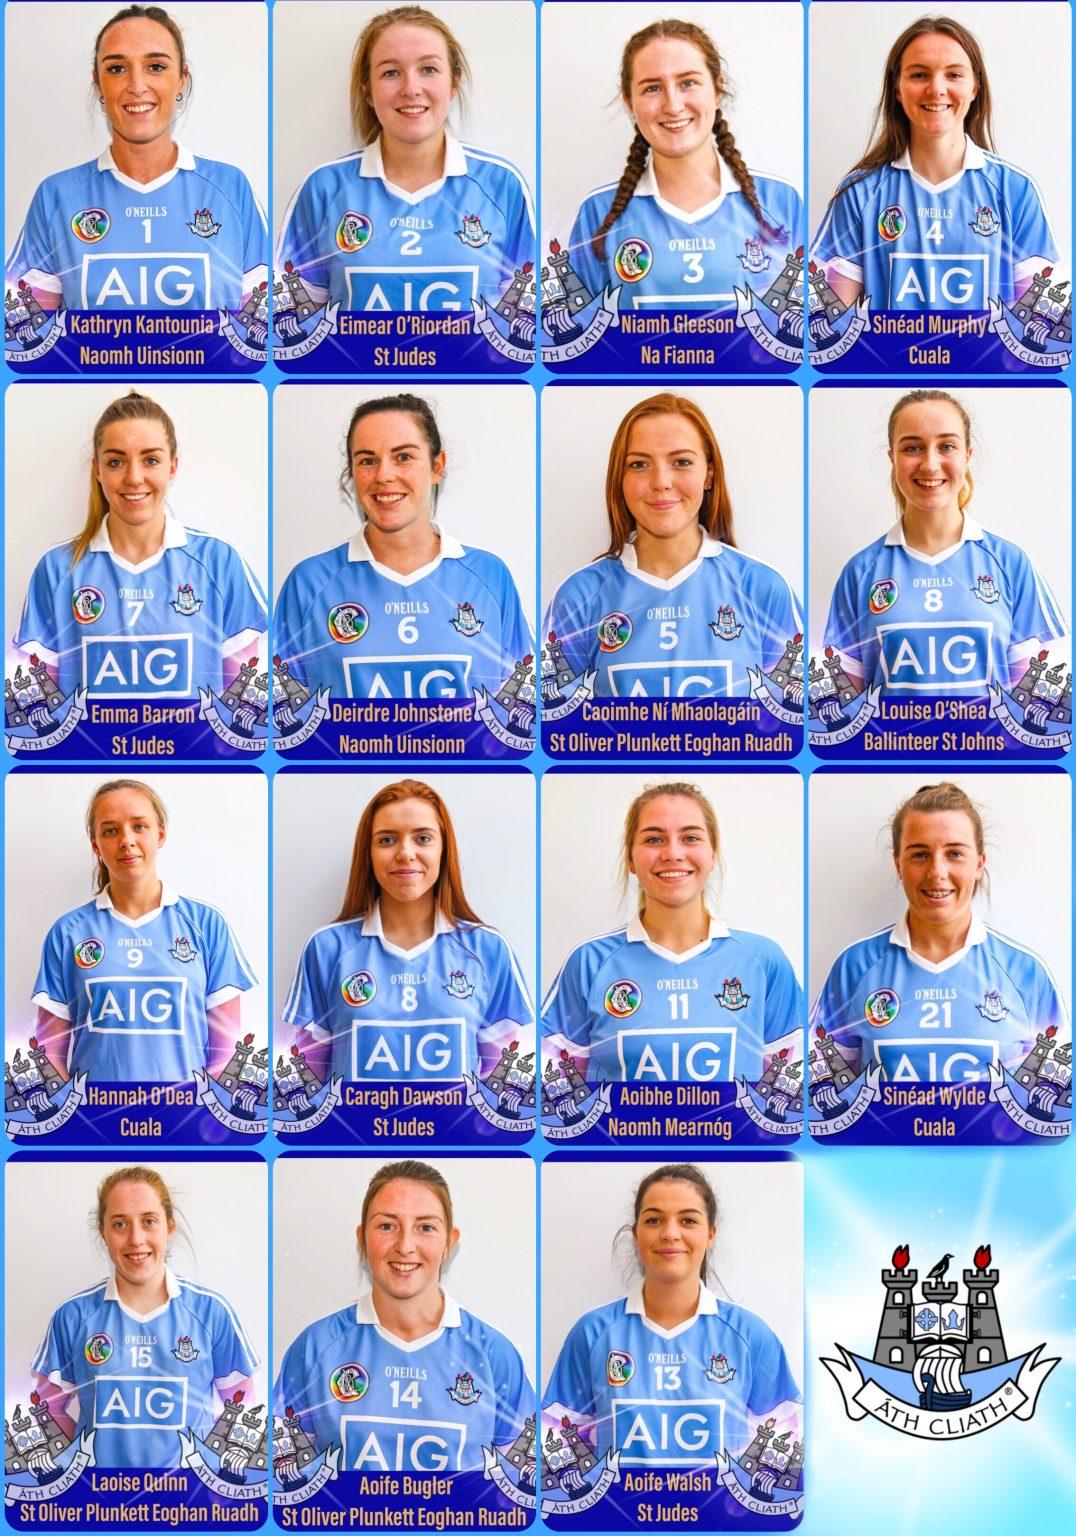 Head Shots of the Dublin Premier Junior team announced for the Premier Junior All Ireland Final